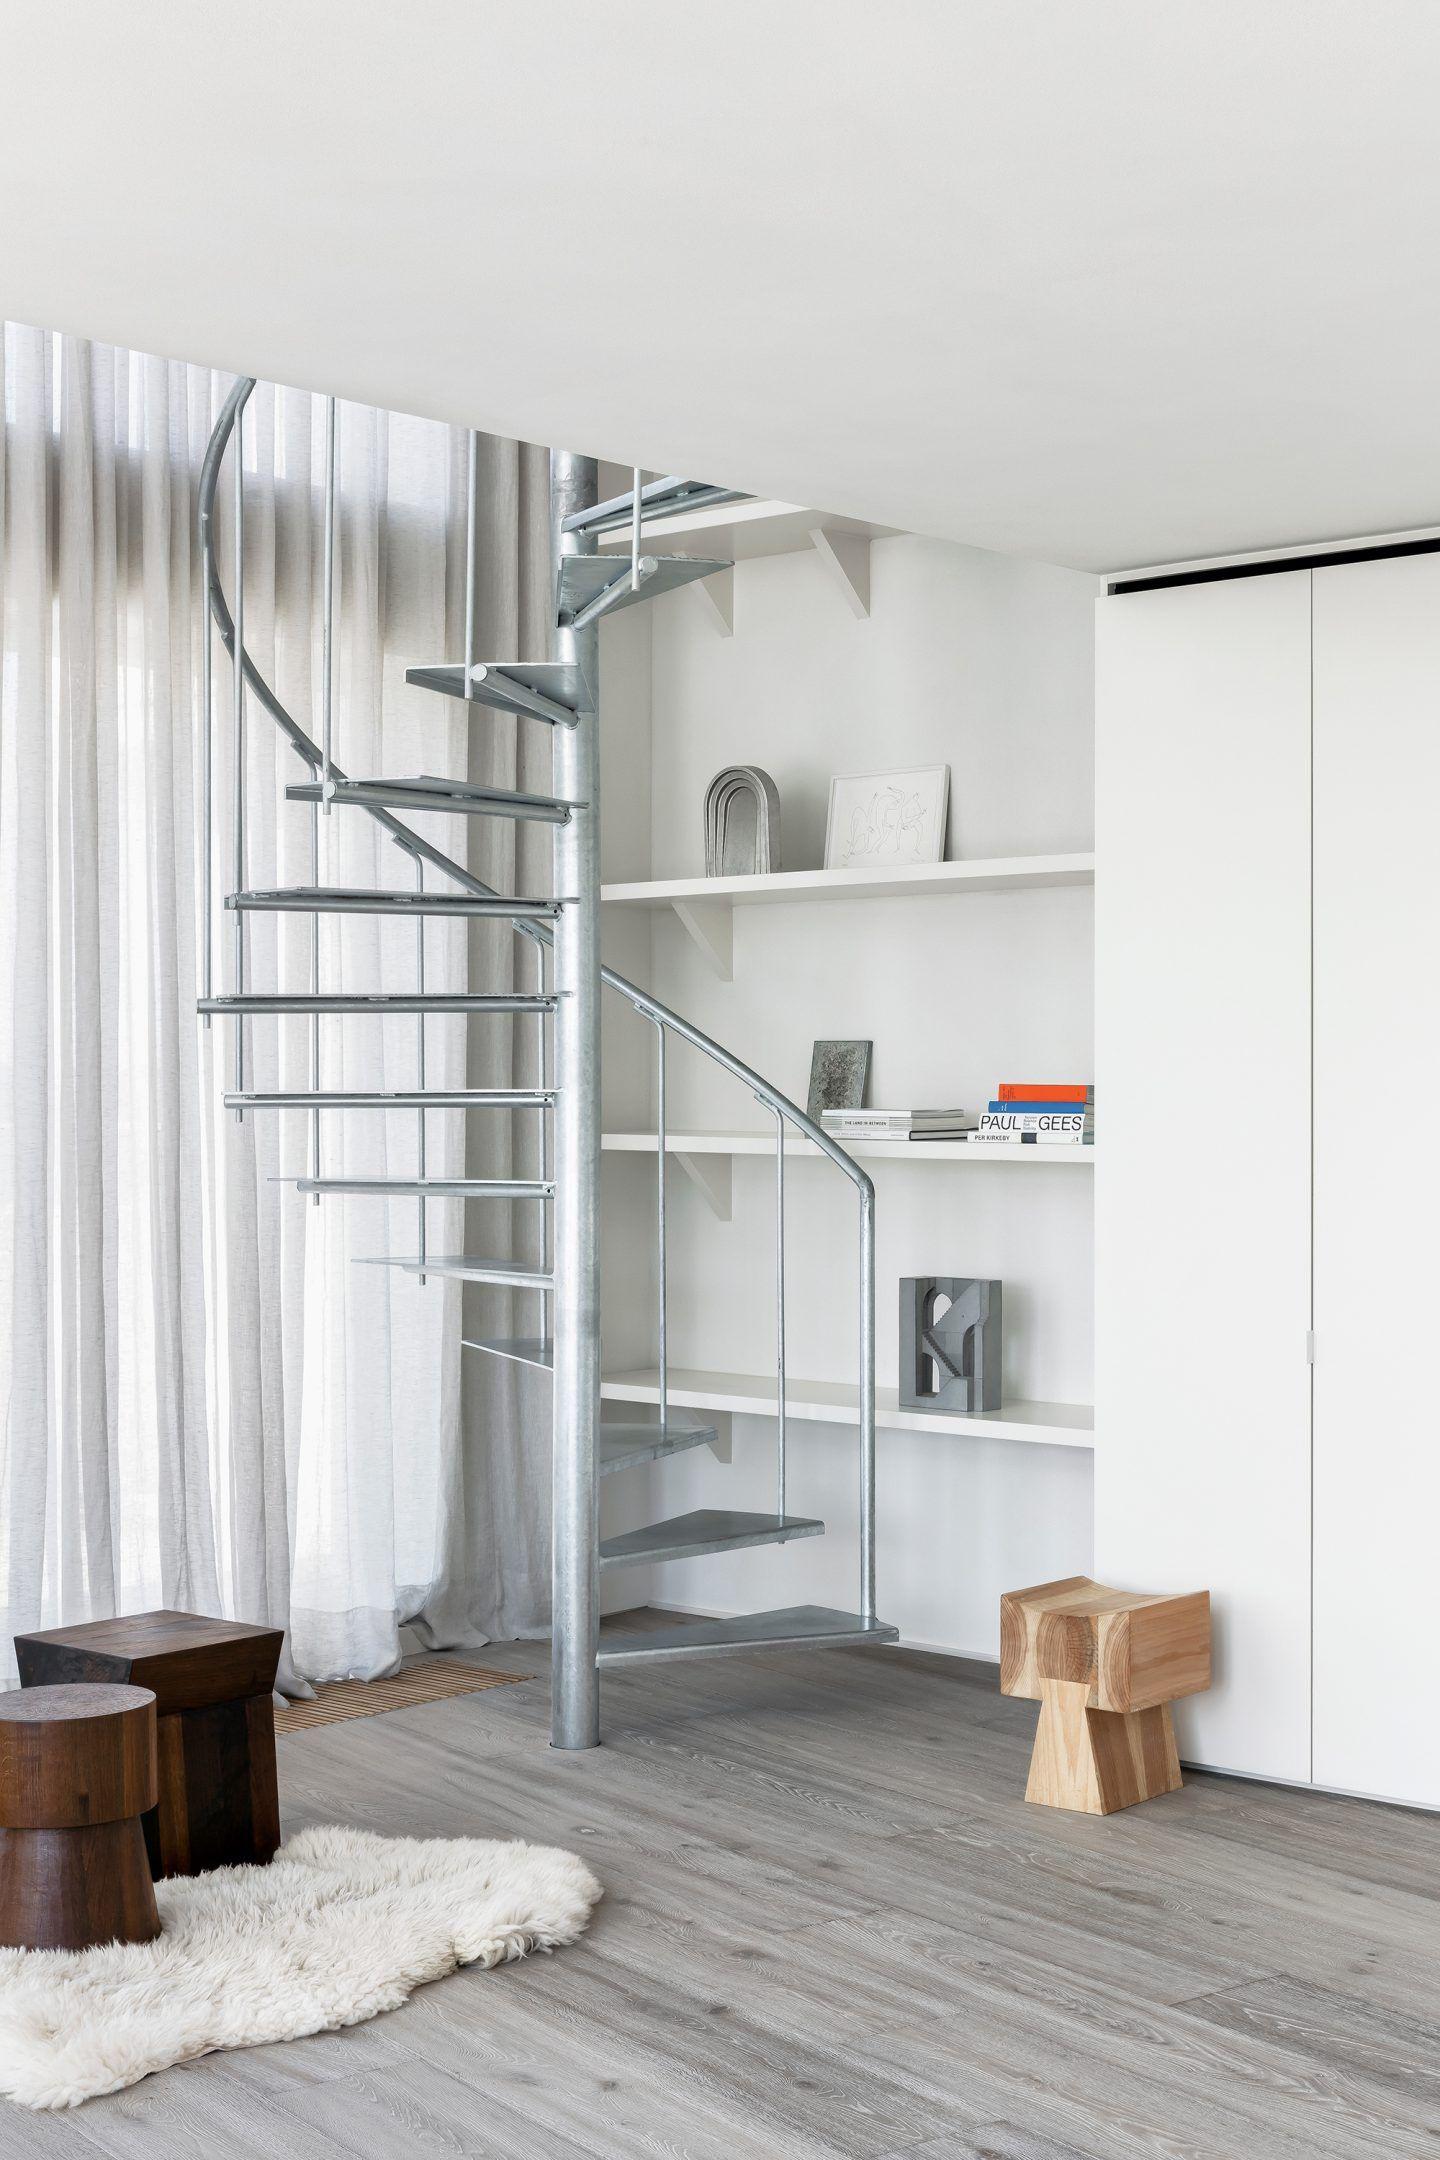 IGNANT-Architecture-Belgian-House-3